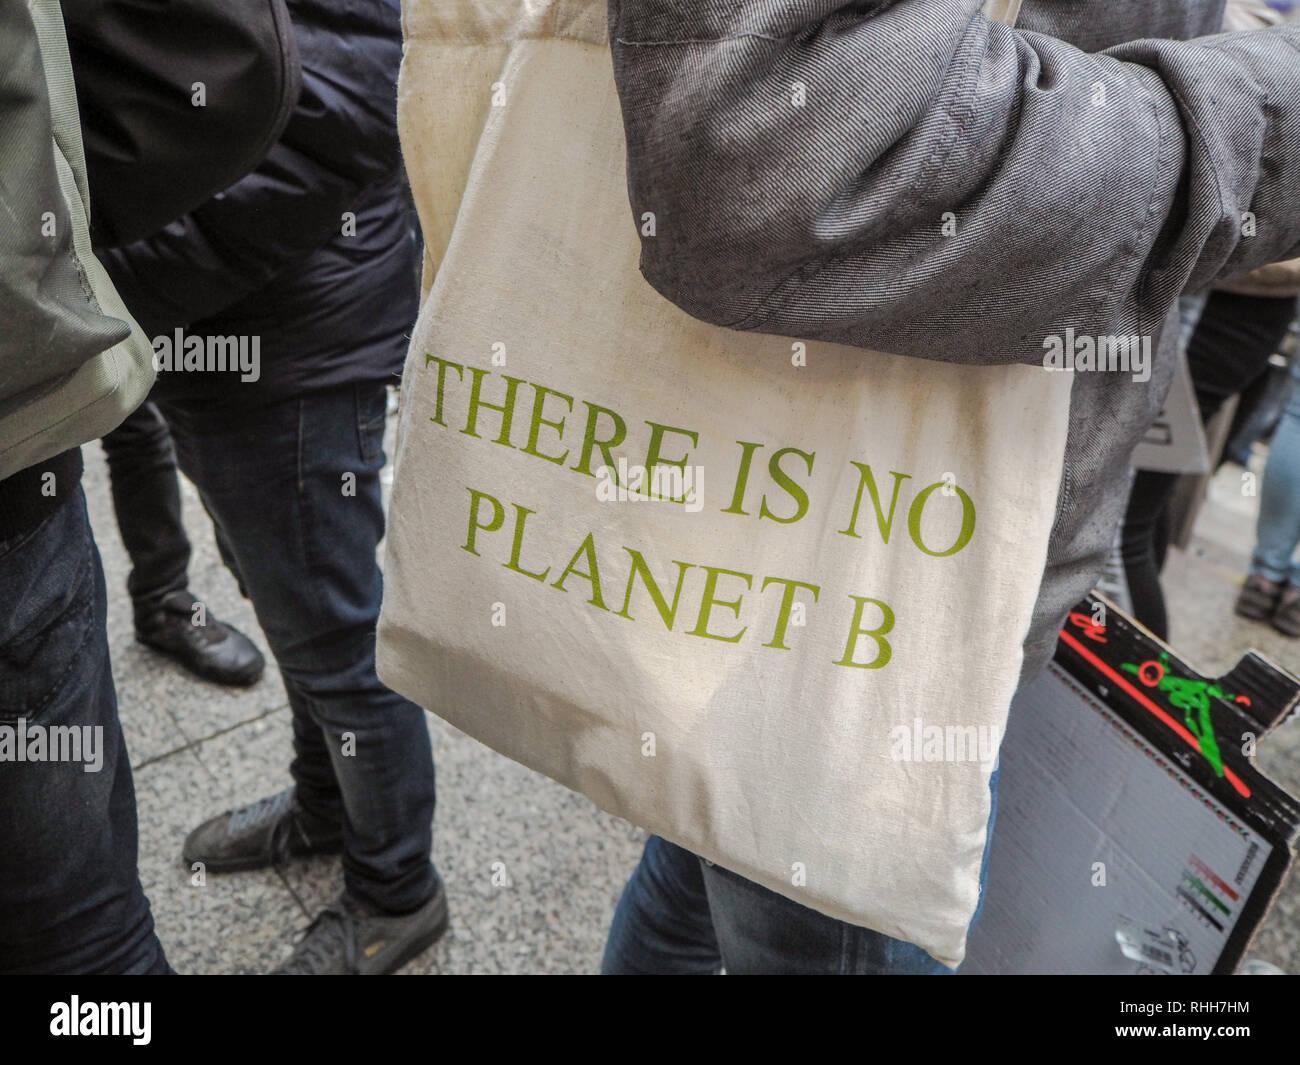 NO PLANET B TOTE BAG FOR LIFE extinction rebellion climate change ECO VEGAN